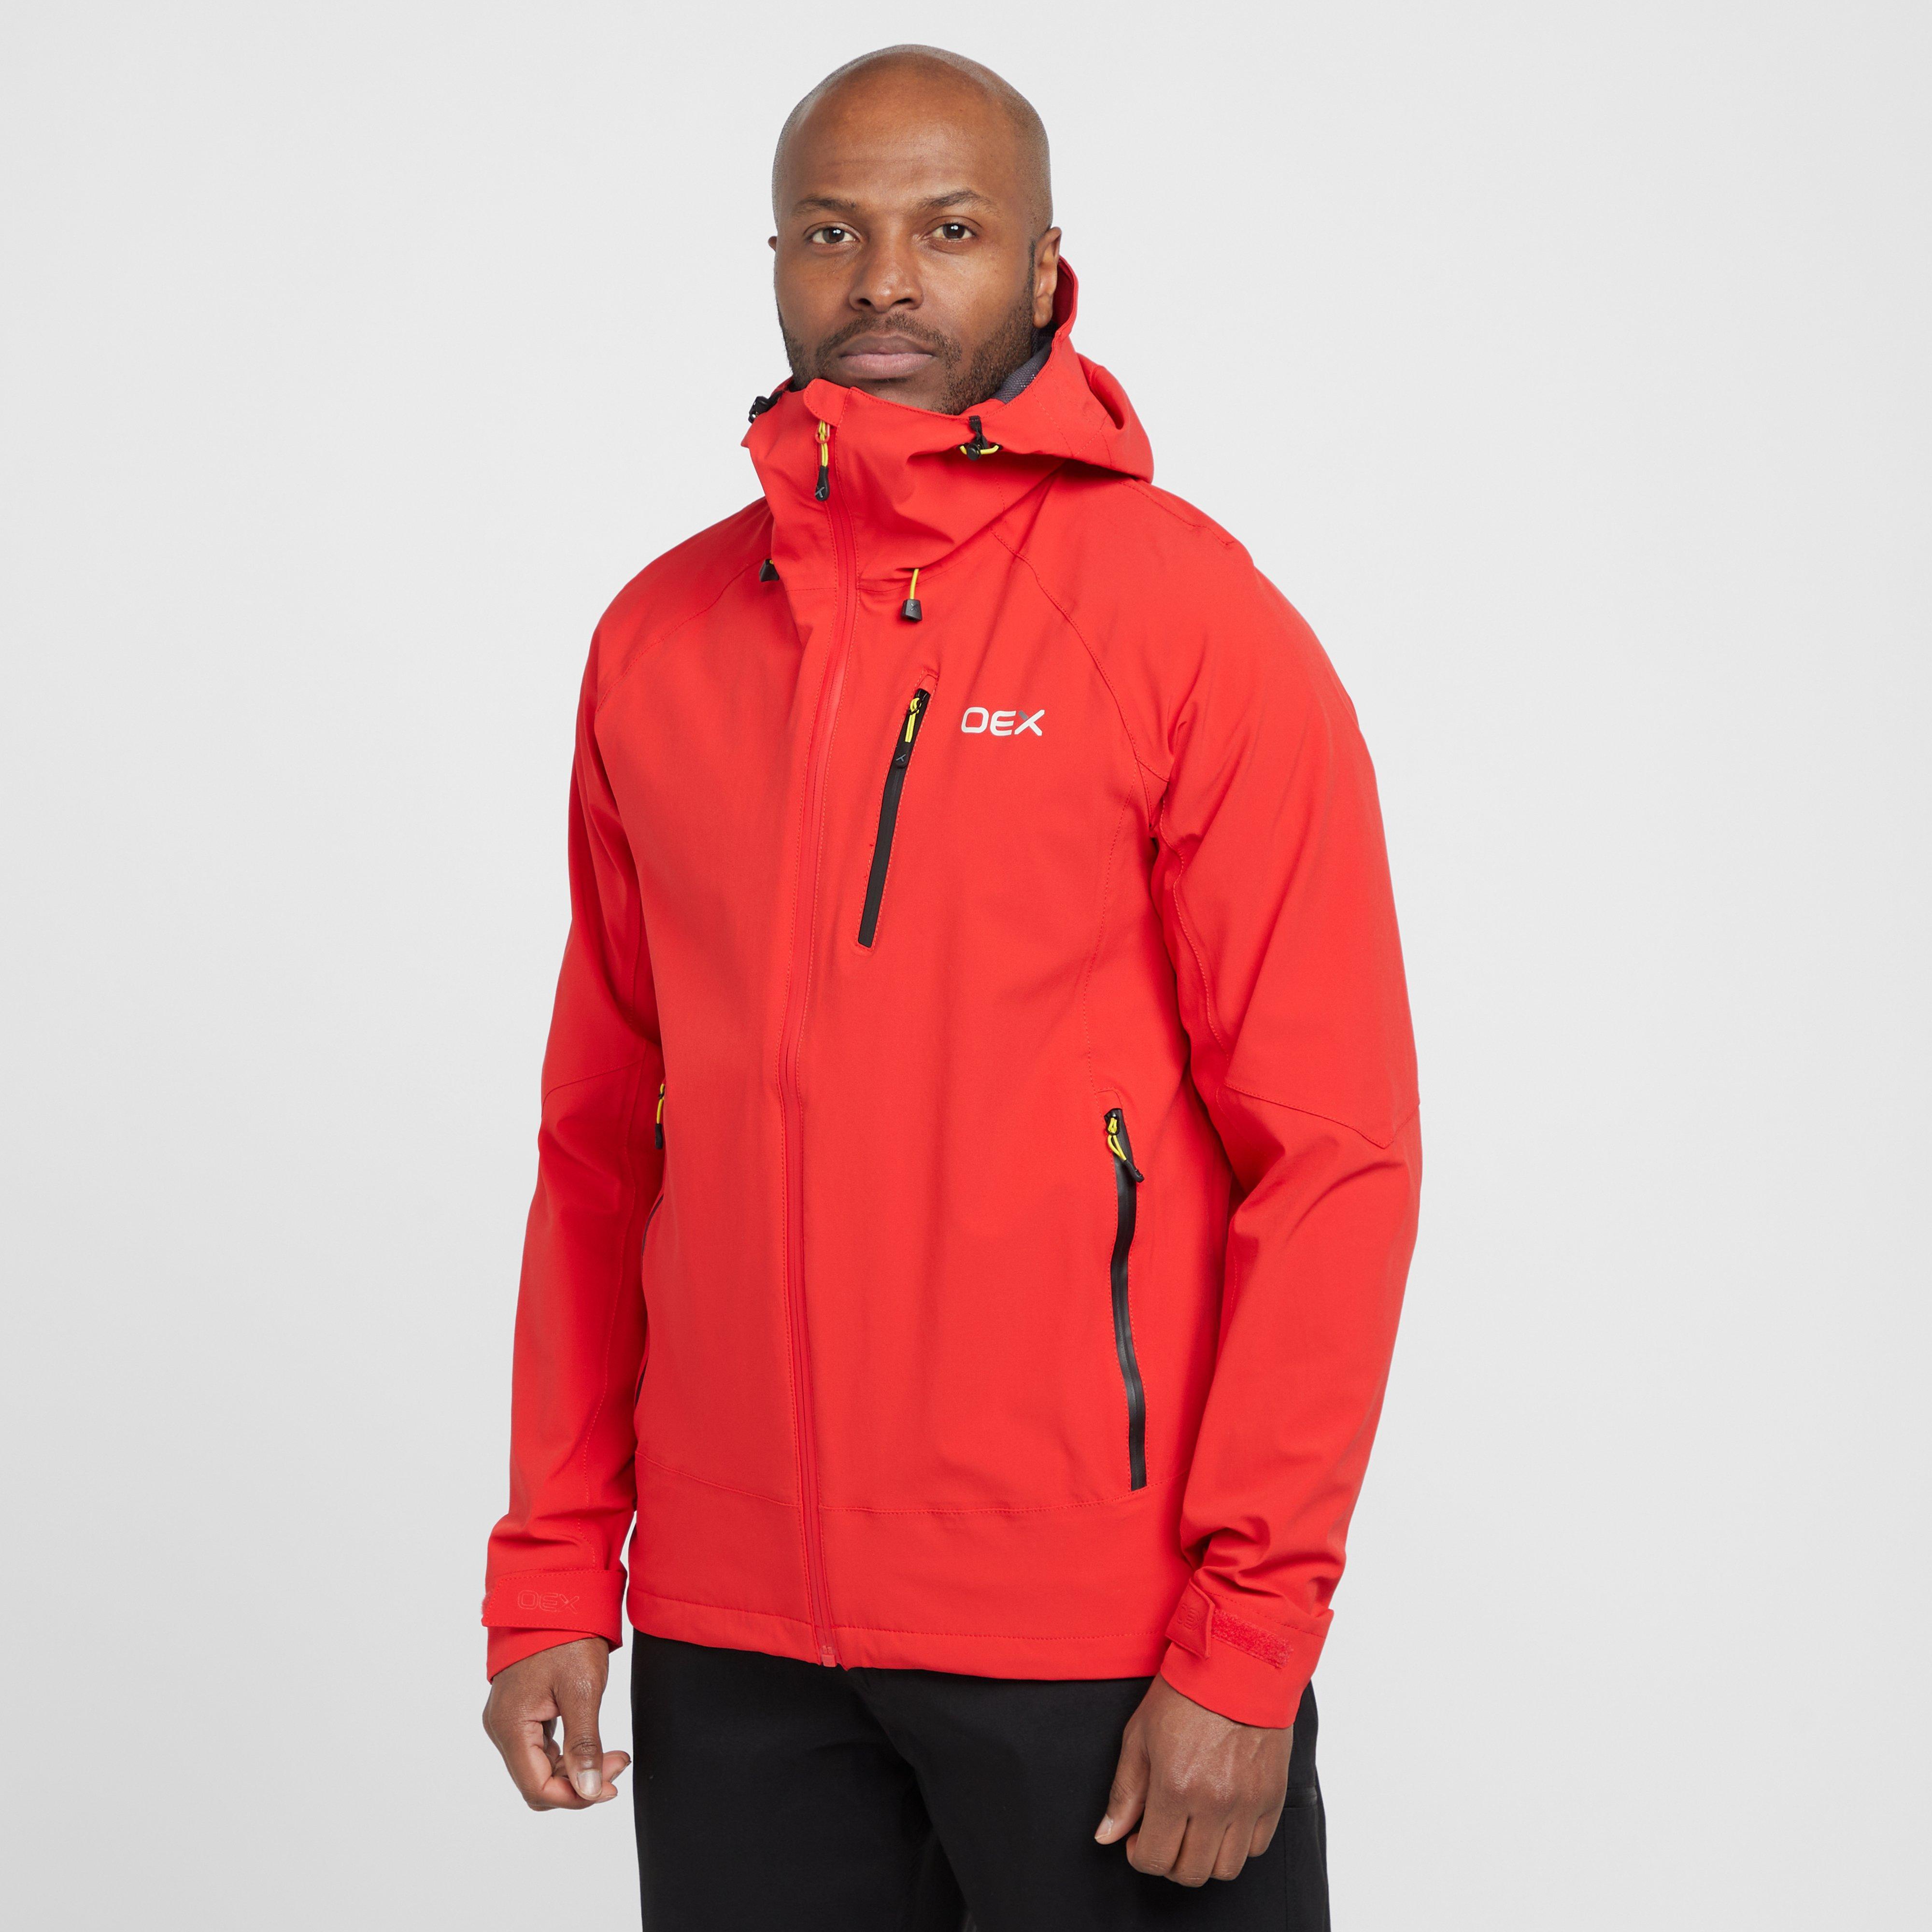 Oex Oex Mens Aonach Waterproof Jacket, Orange